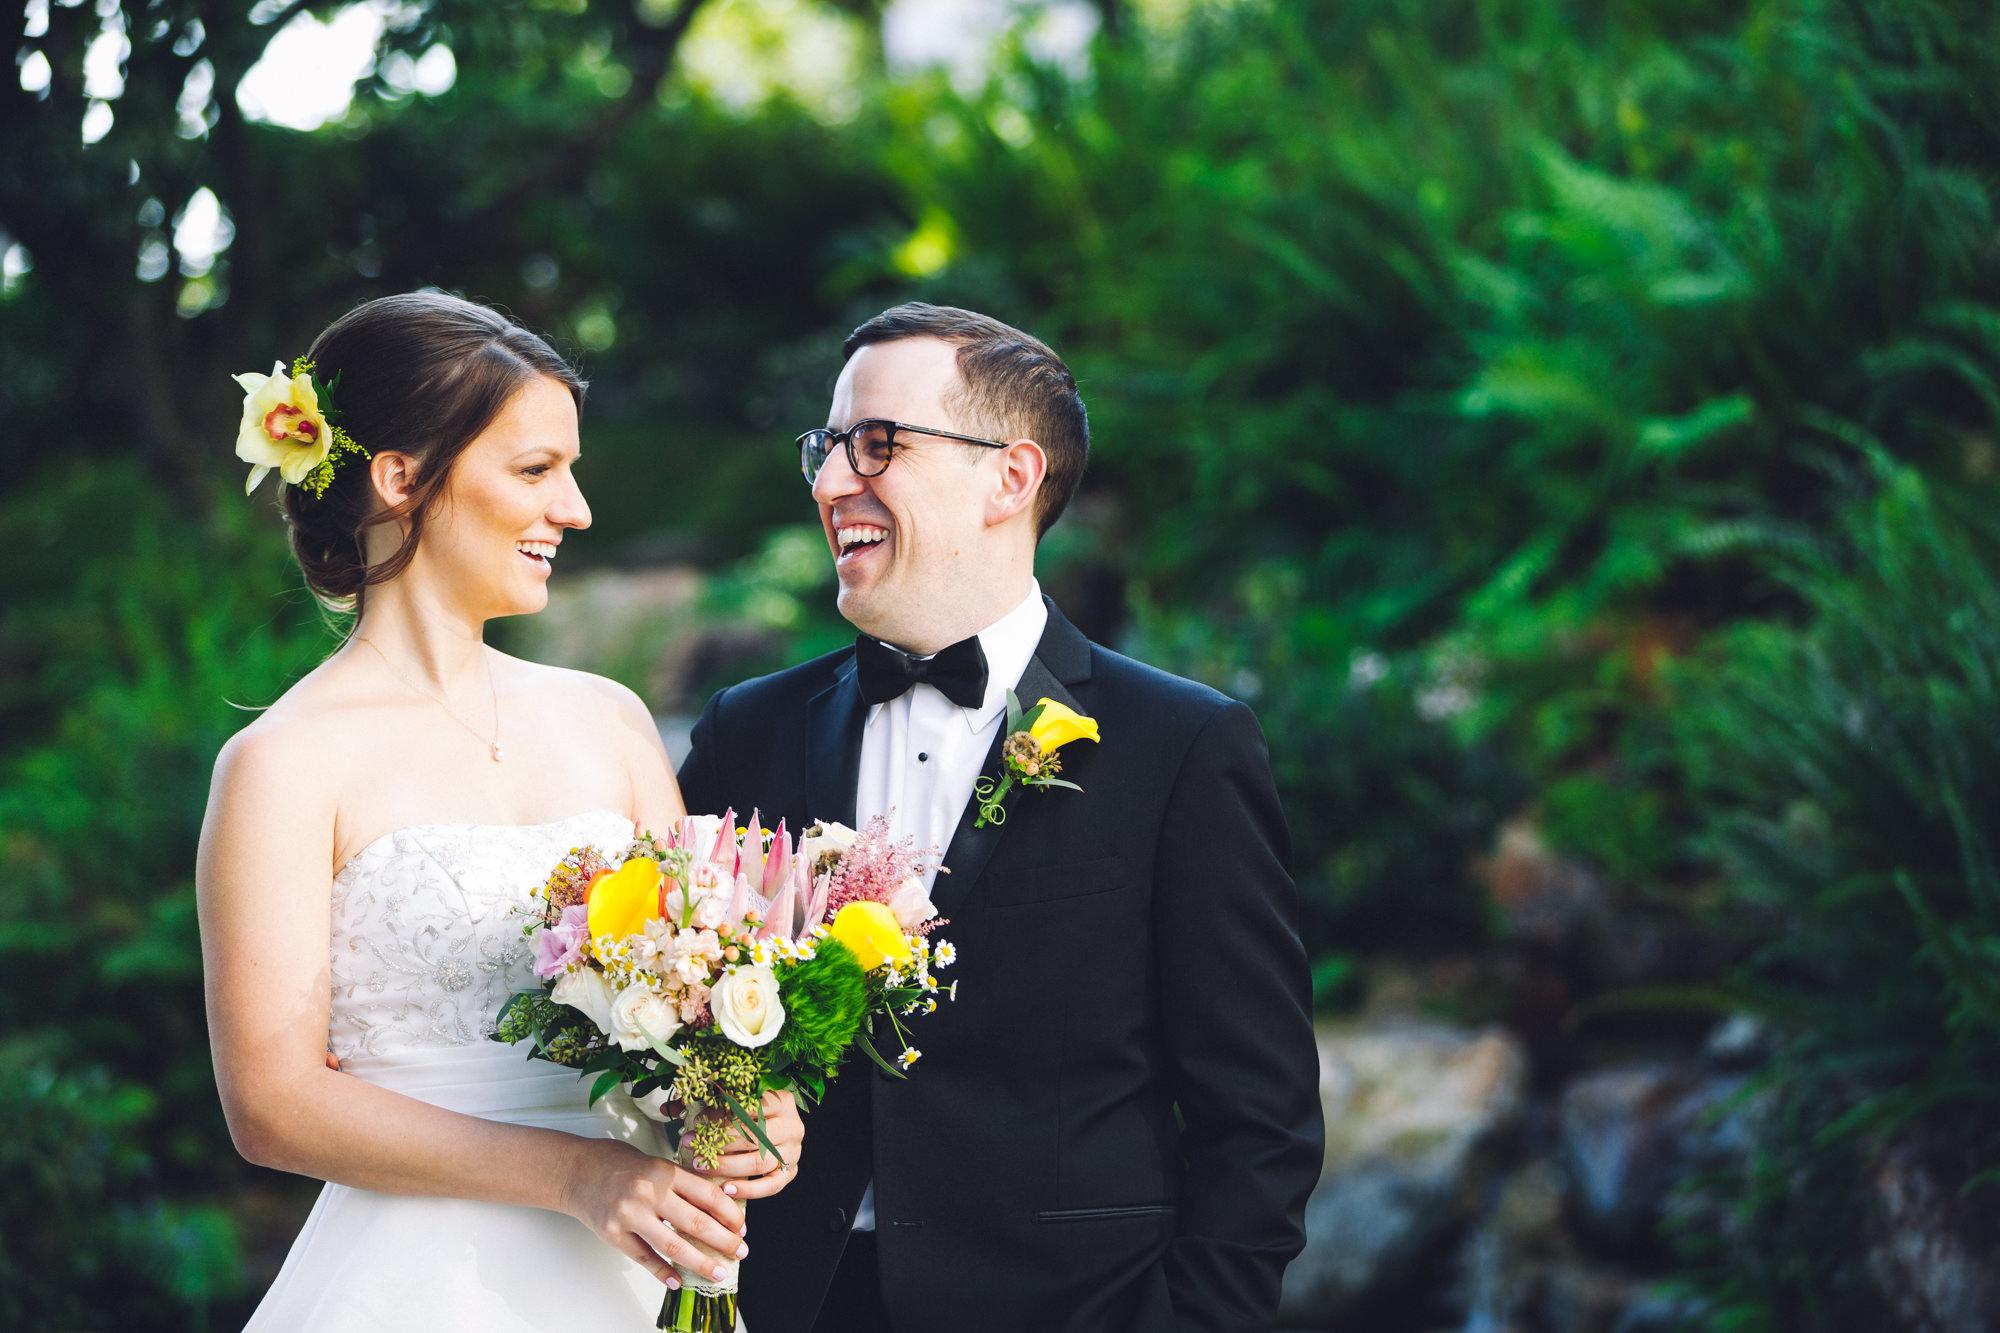 thelightandglass-wedding-engagement-photography-053.jpg